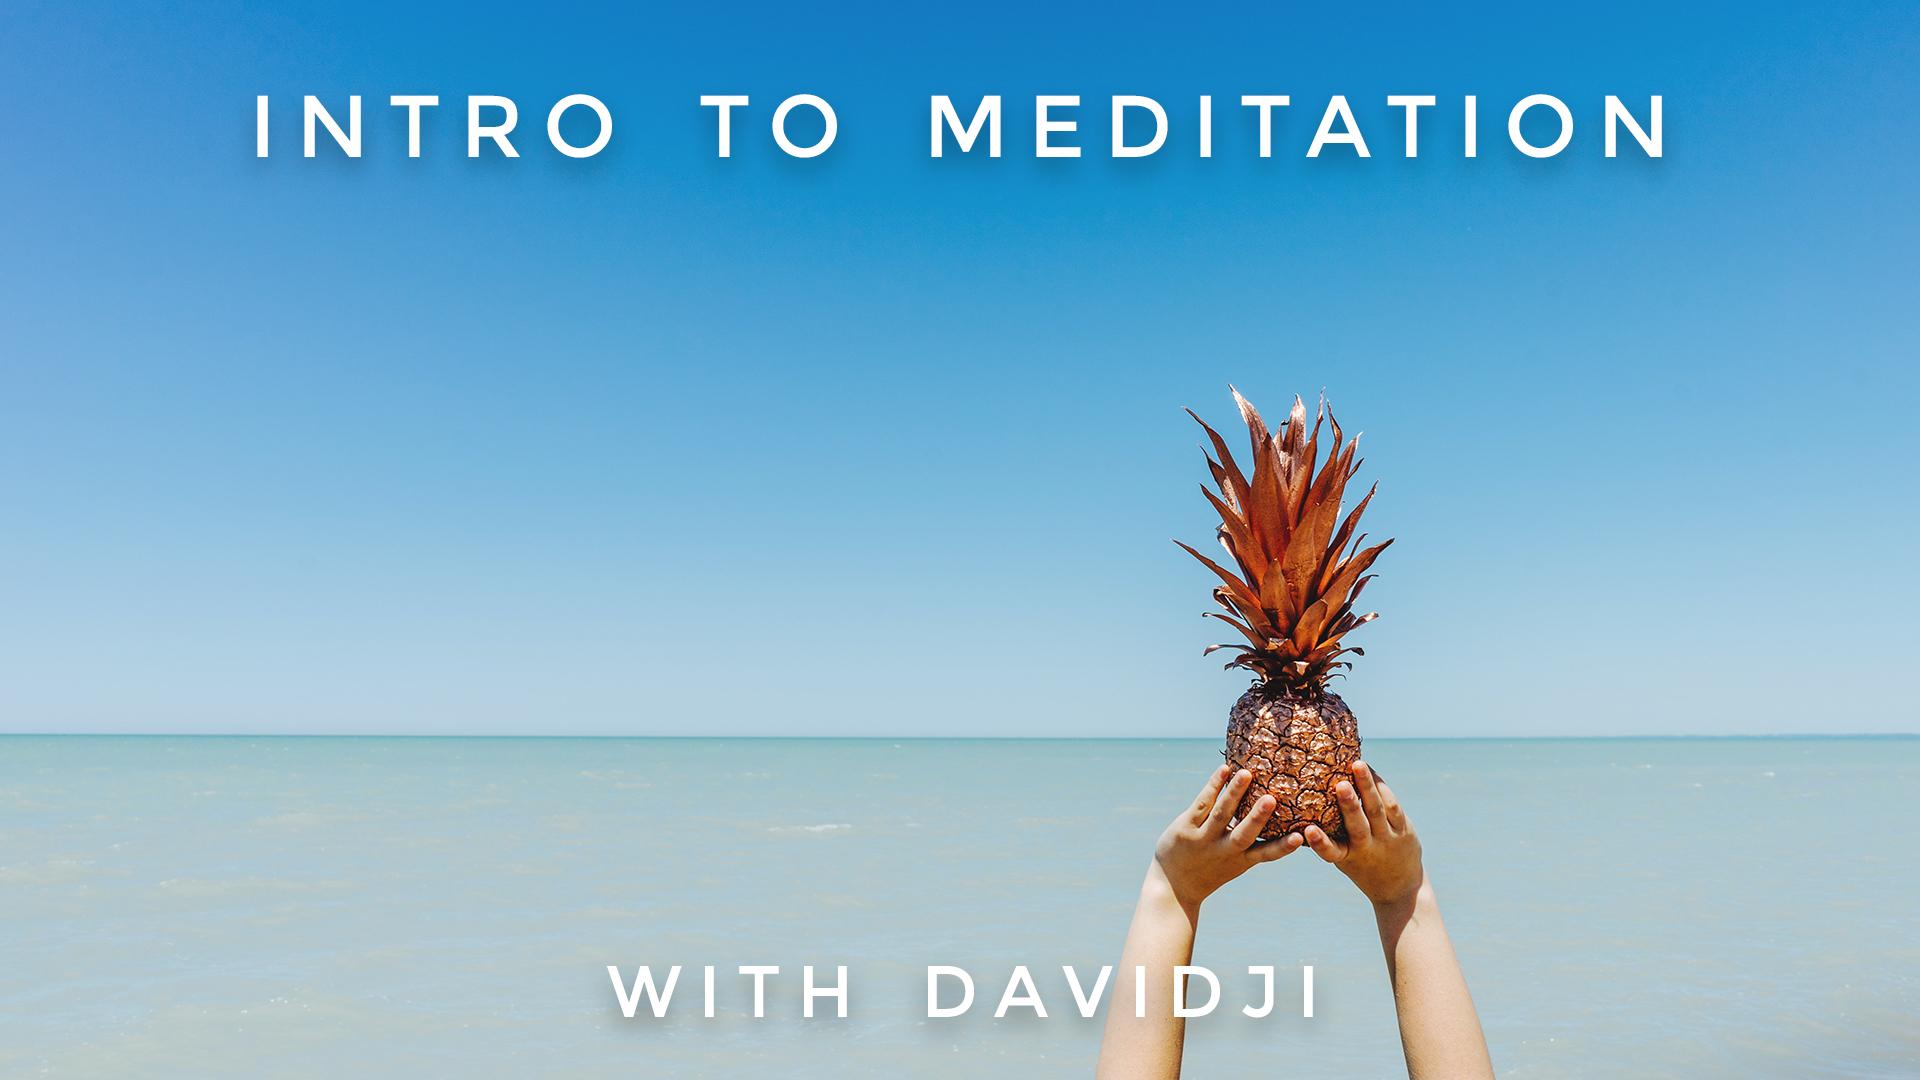 Unplug-Meditation-VHX-VIDEO-Cover-Artwork_Davidji_Intro-to-meditation.jpg